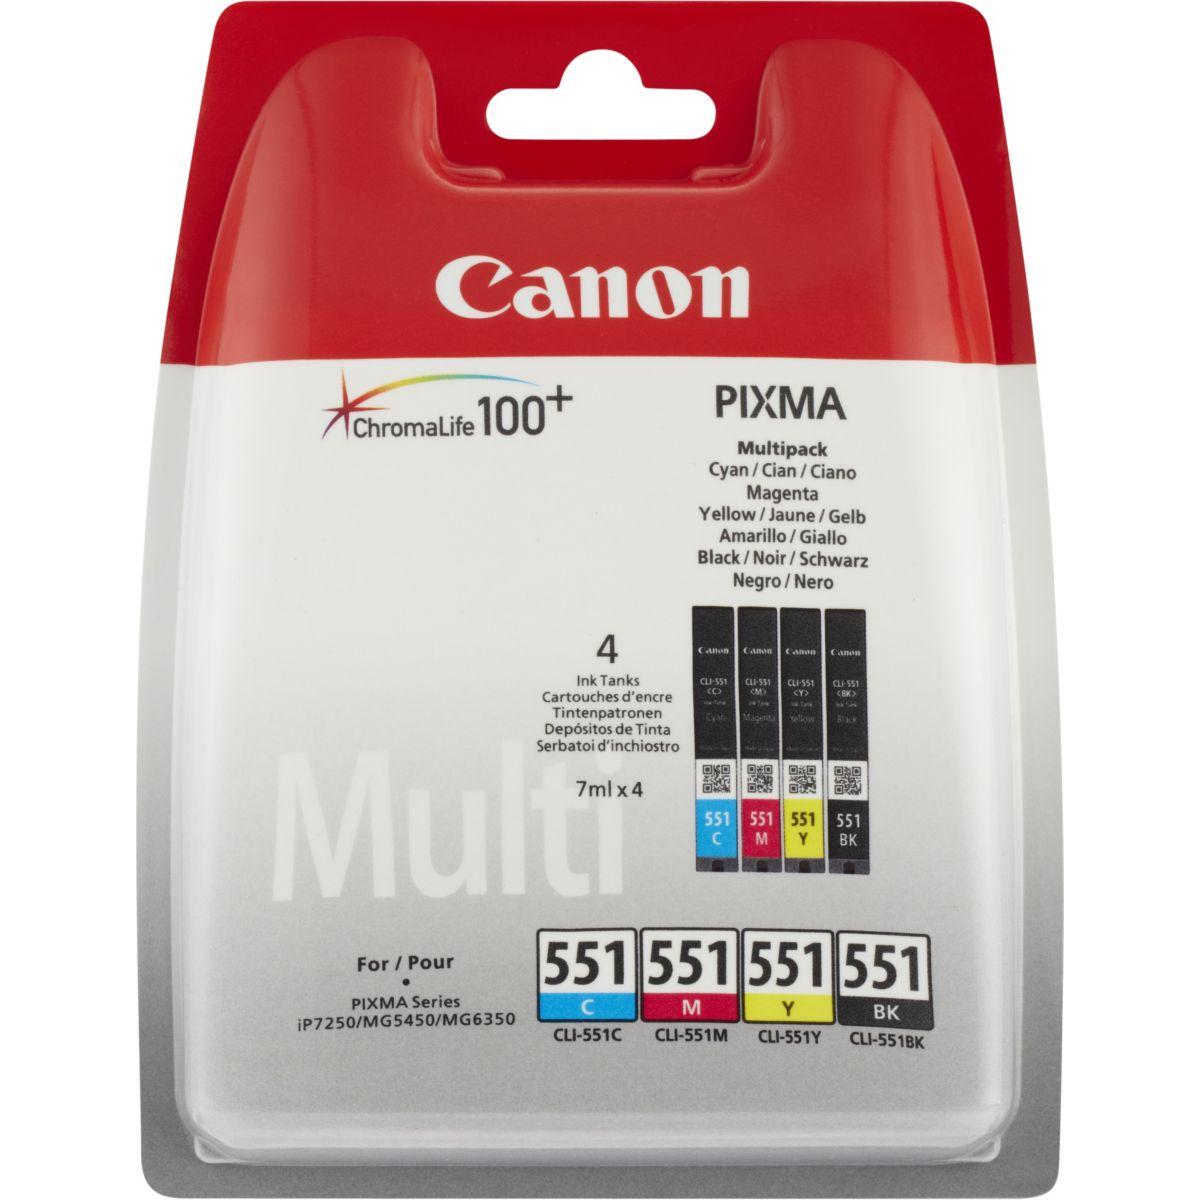 Multipack cartouches d'encre canon 4 couleurs cli551